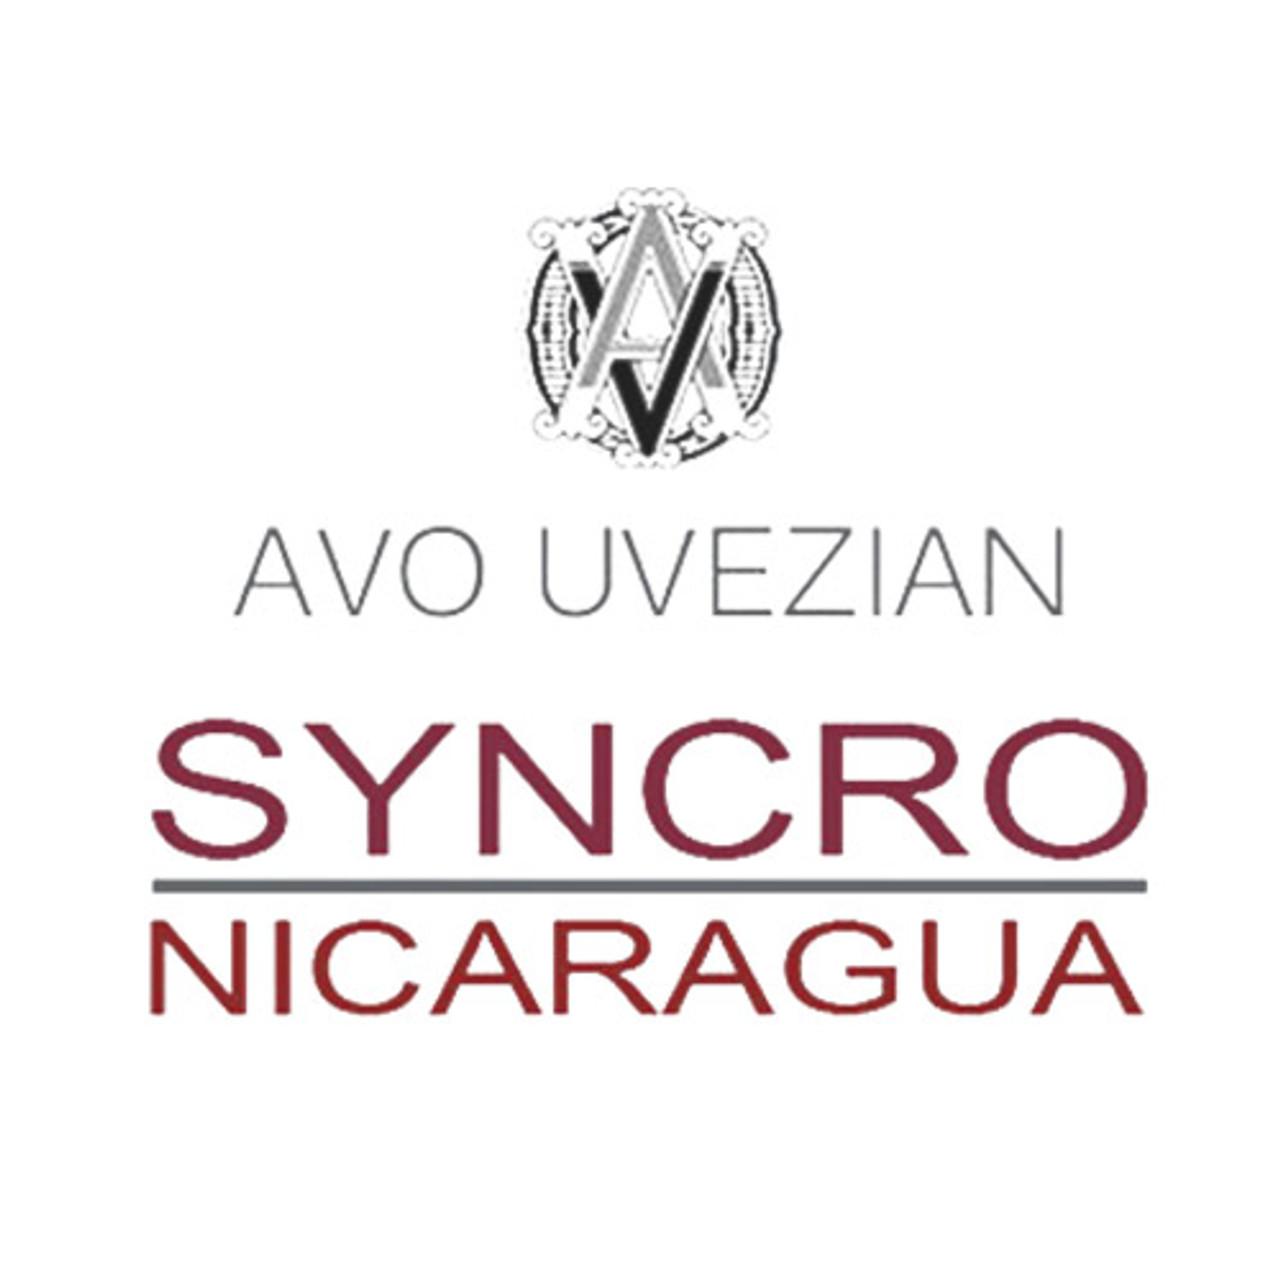 AVO Syncro Nicaragua Special Toro Cigars - 6 x 60 (Box of 20)